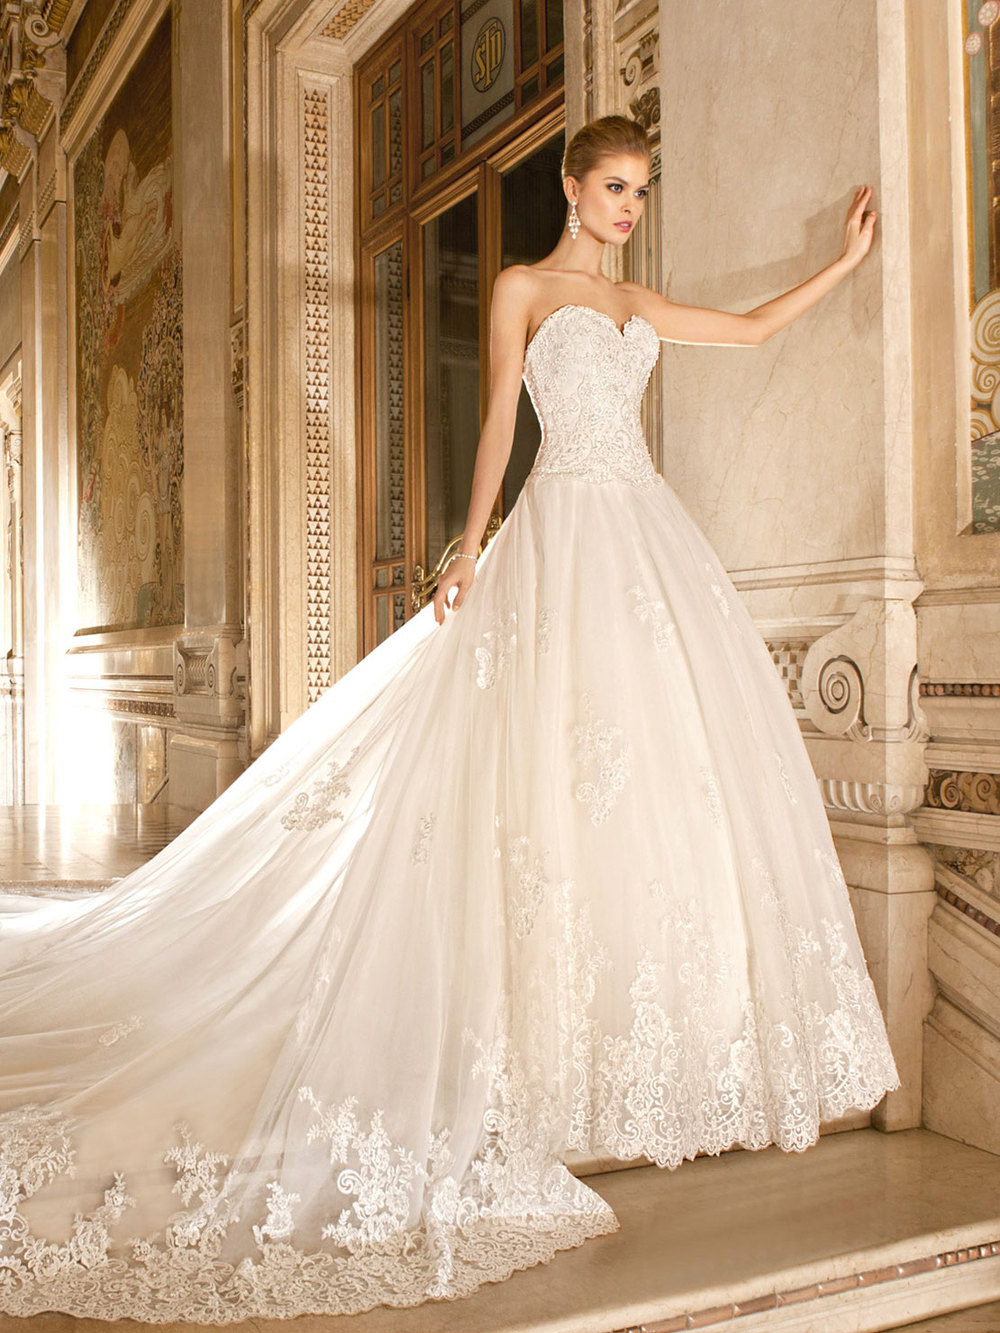 Conservative wedding dresses - SandiegoTowingca.com